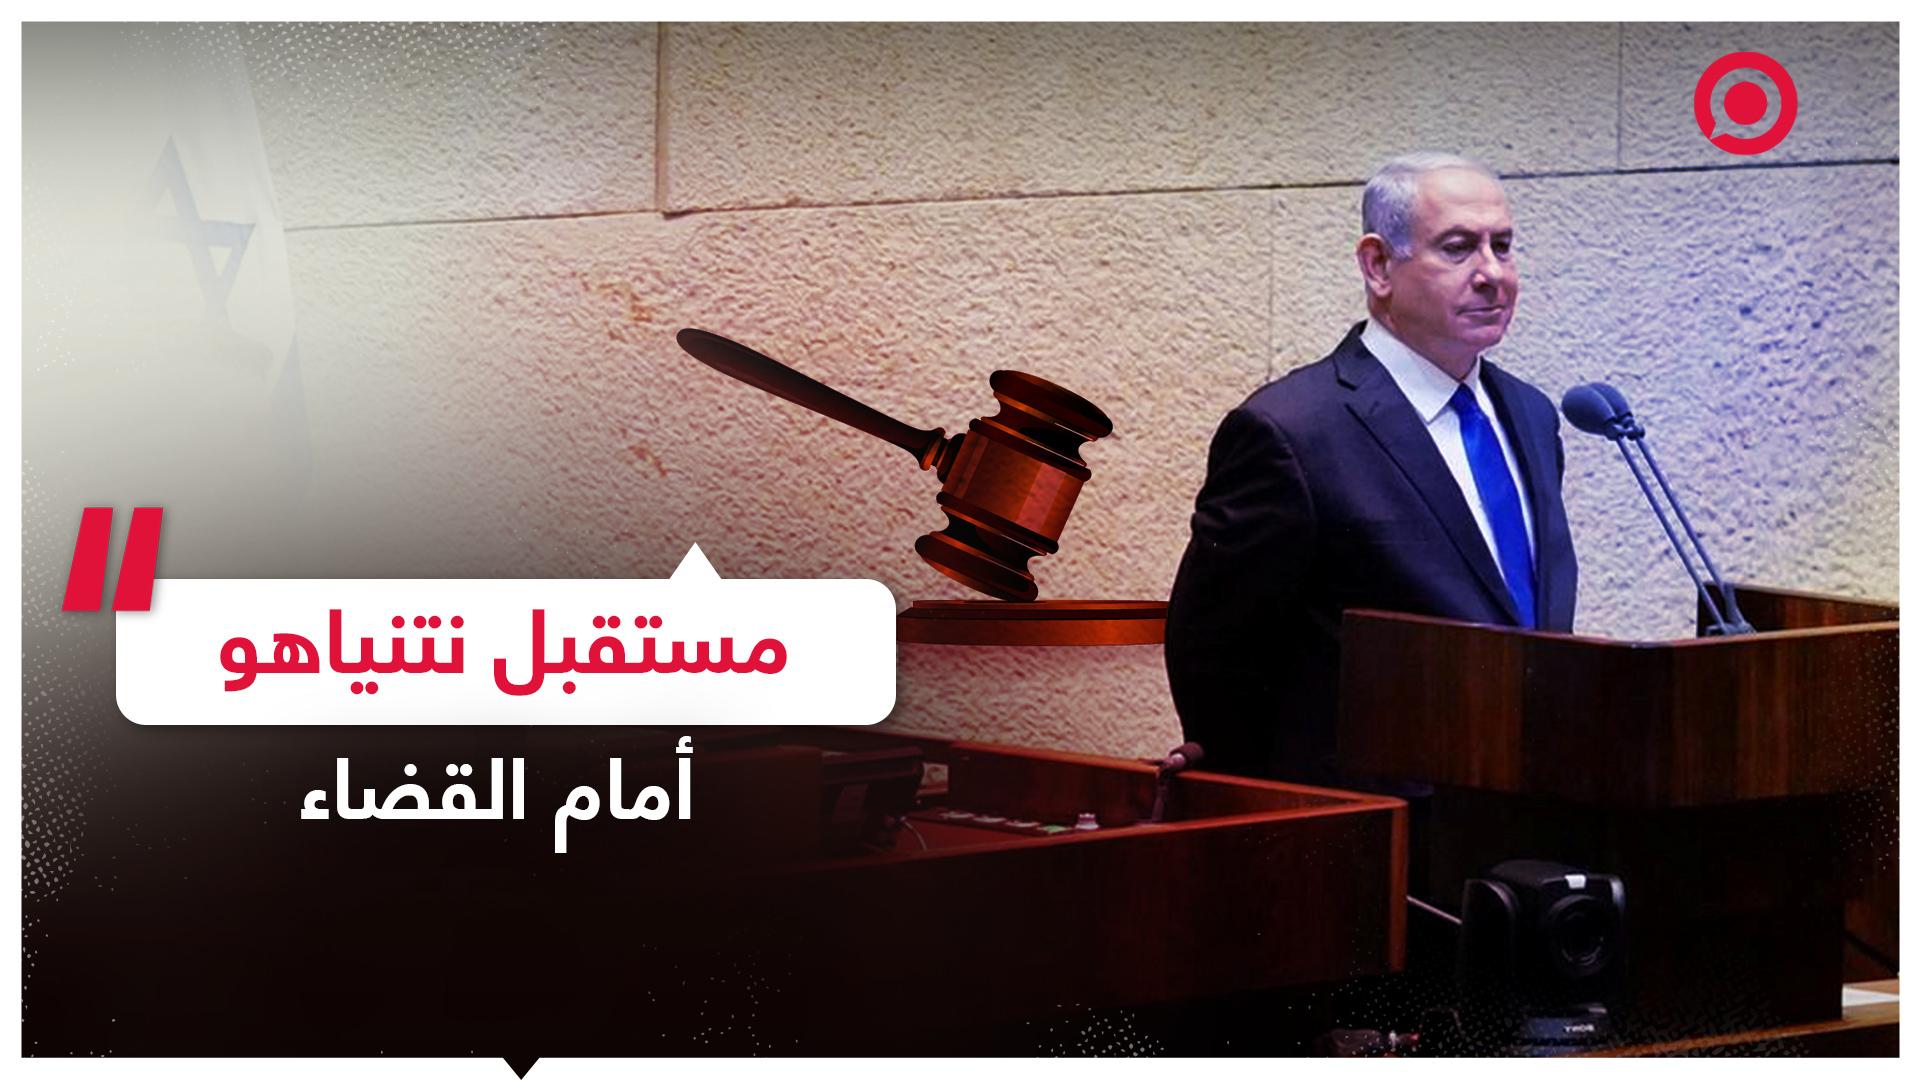 إسرائيل - نتنياهو - محاكمة